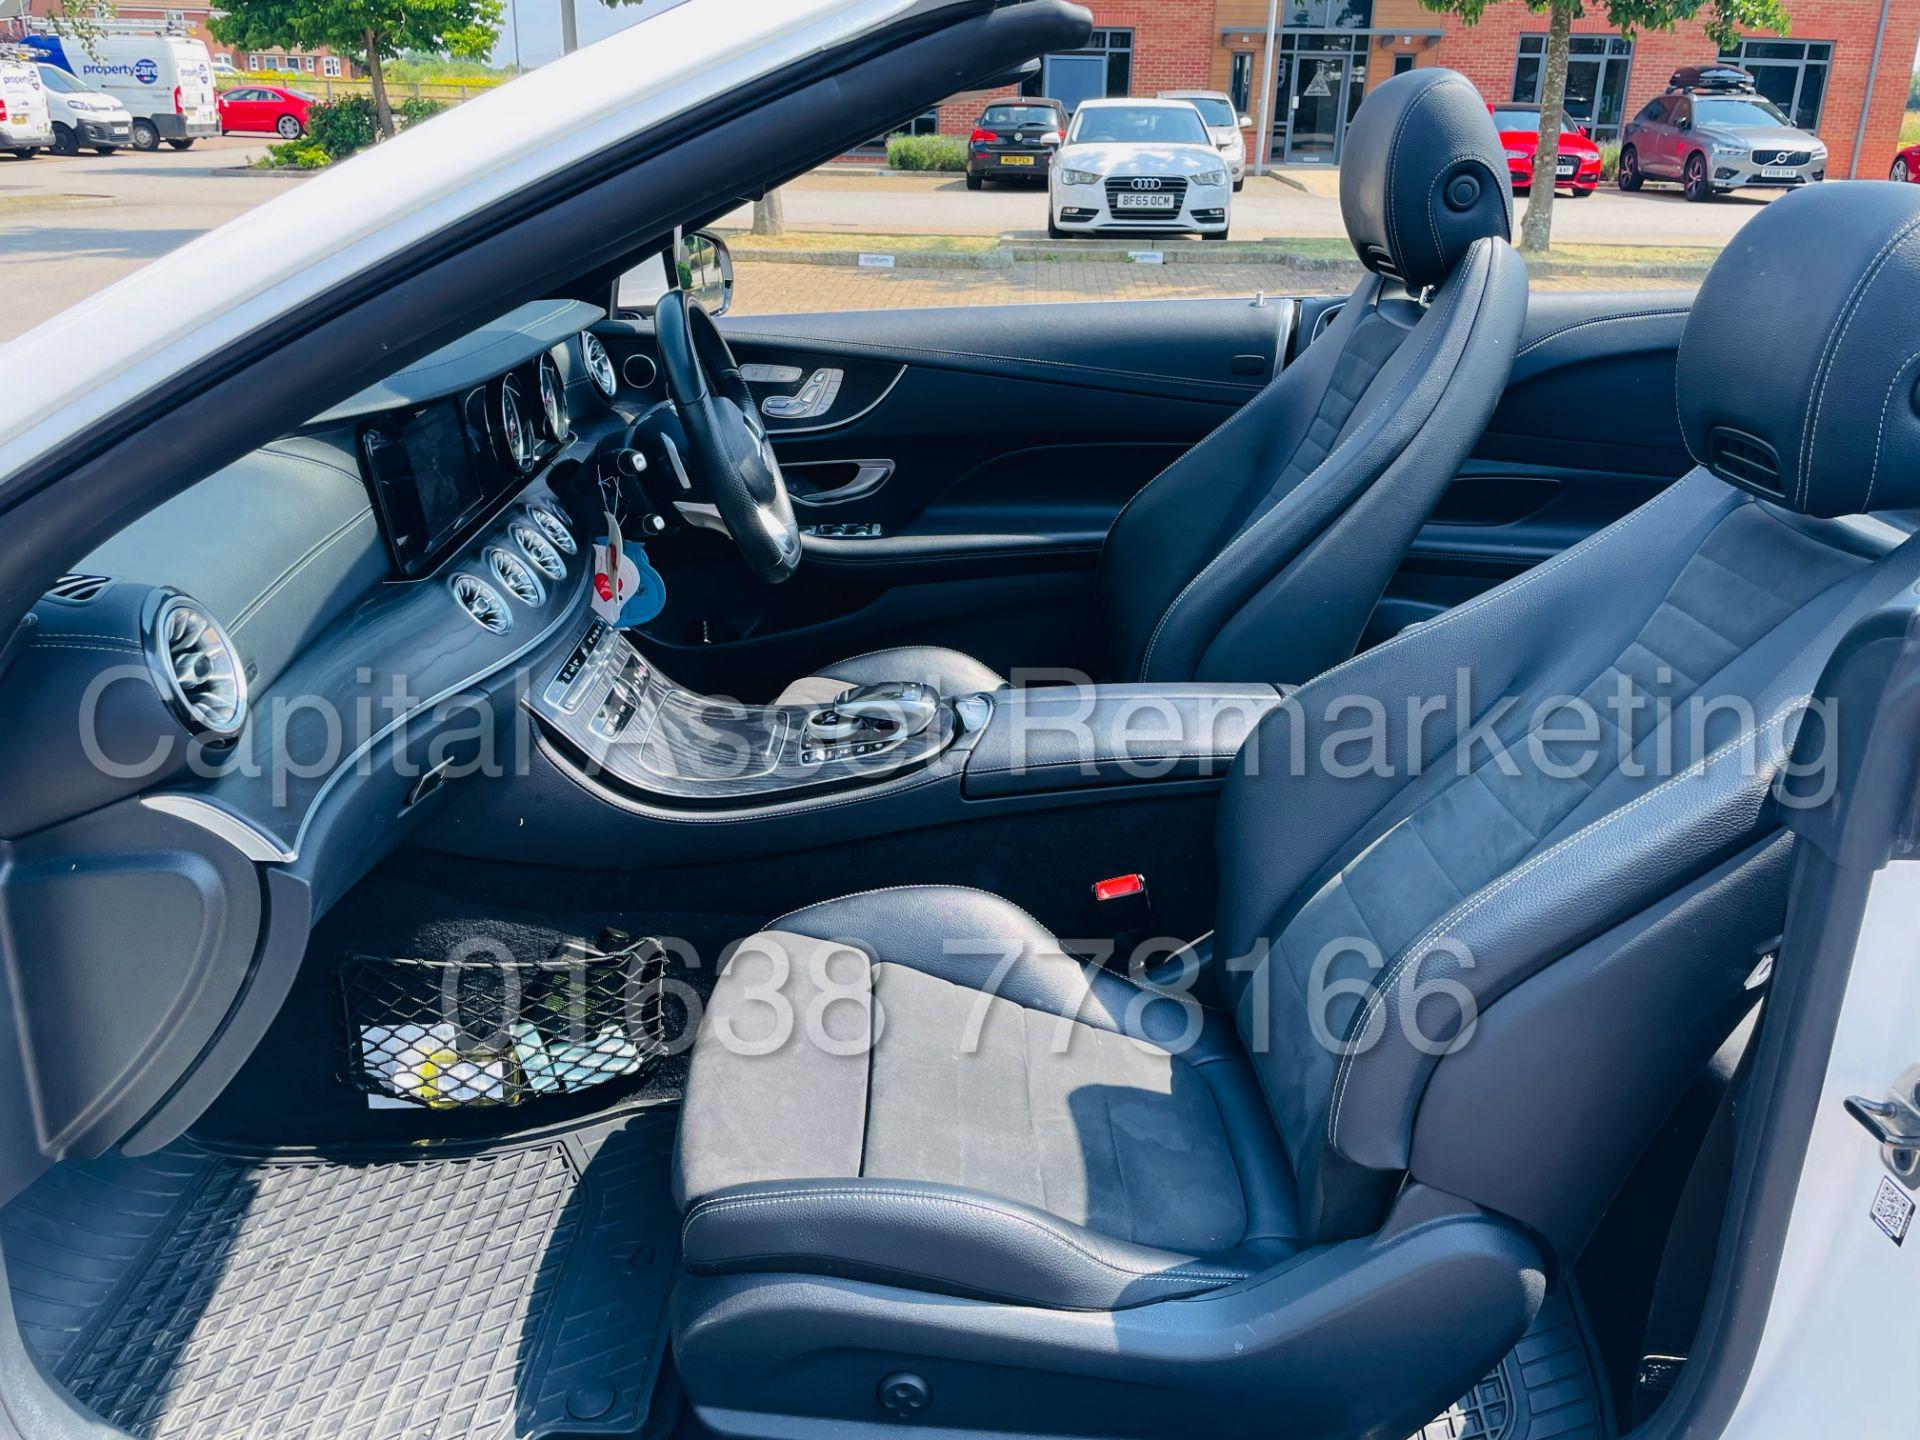 MERCEDES-BENZ E220d *AMG LINE PREMIUM - CABRIOLET* (2018 - EURO 6) '9G AUTO - LEATHER - SAT NAV' - Image 39 of 63